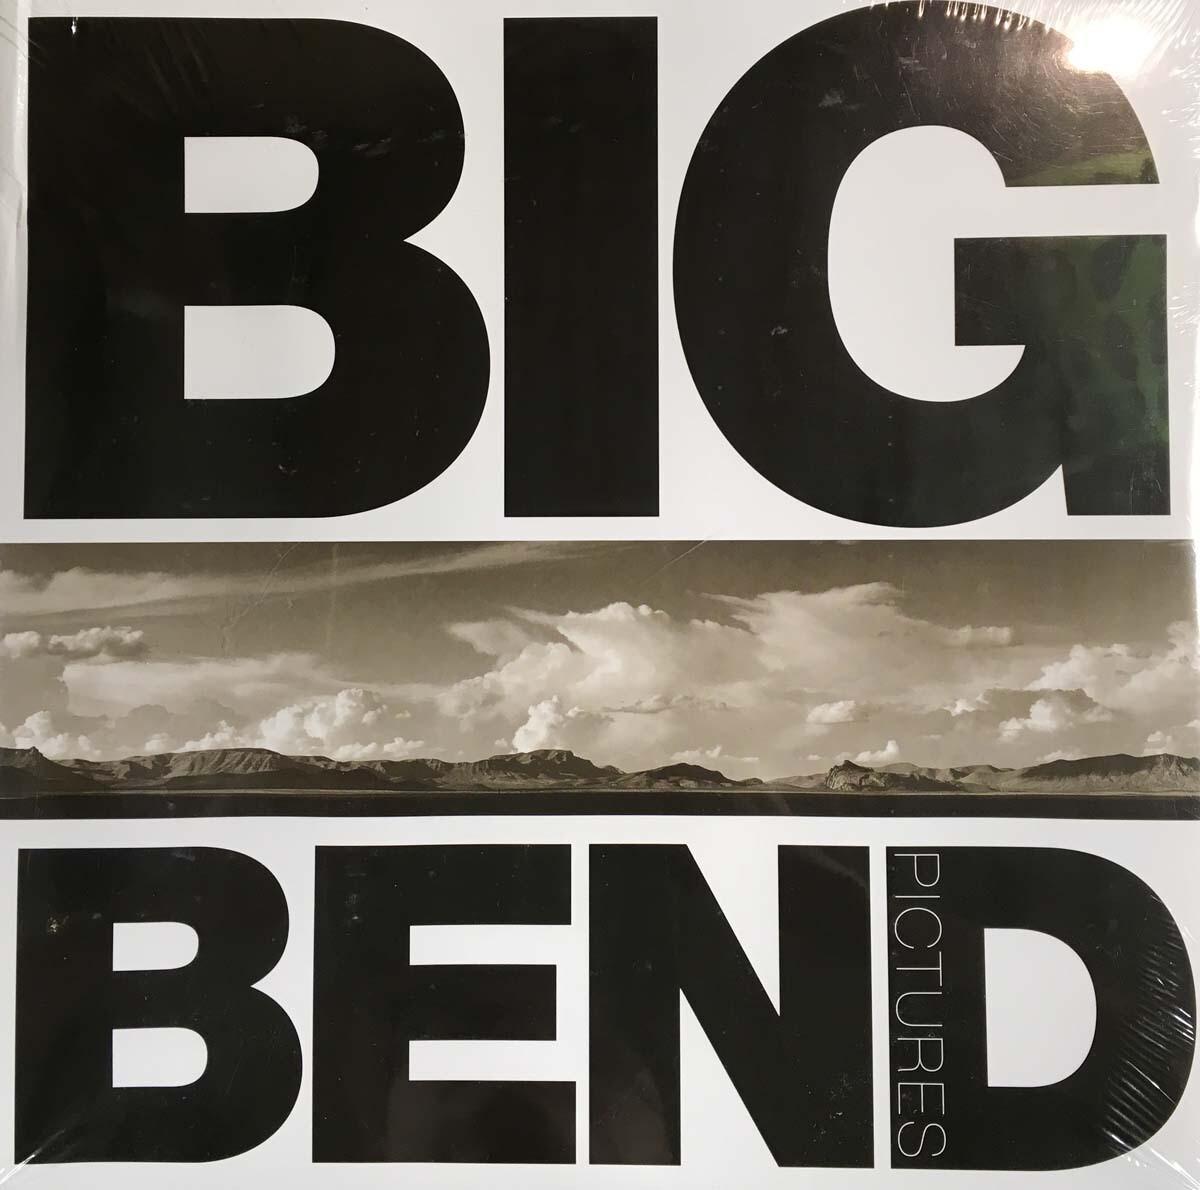 Big Bend Pictures